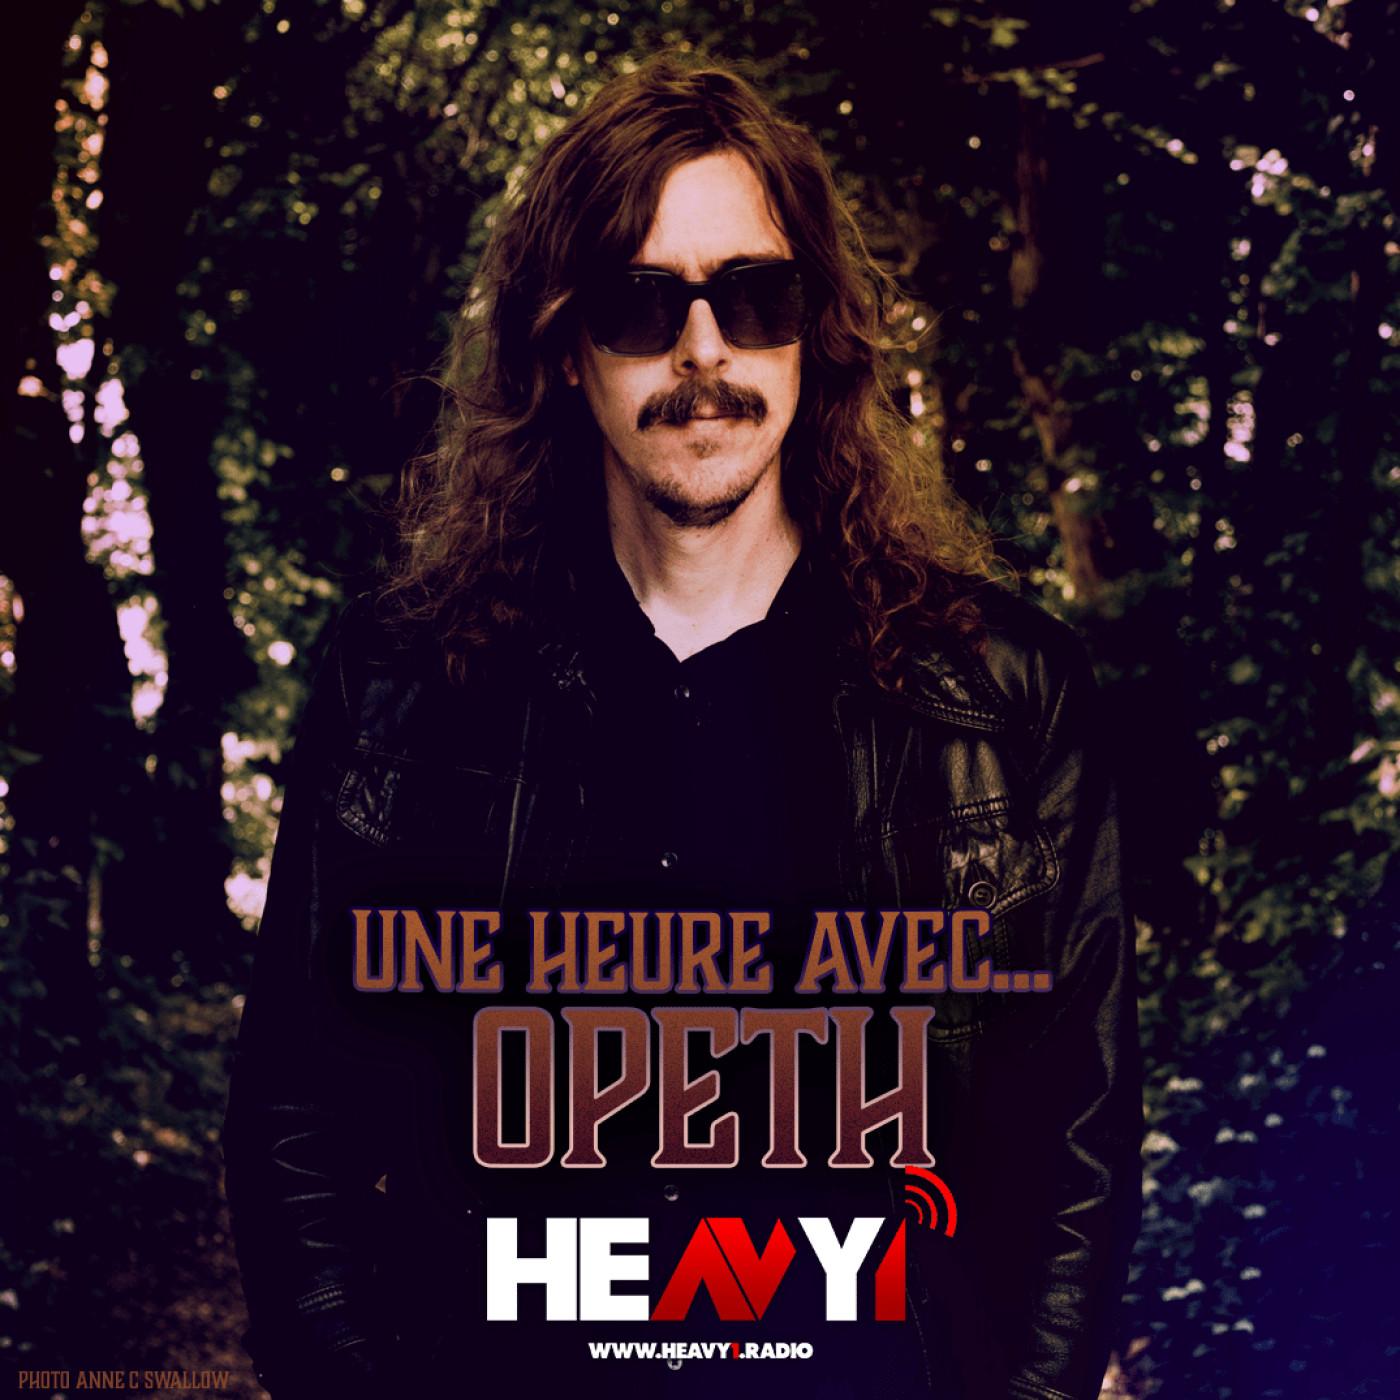 Une heure avec... Opeth